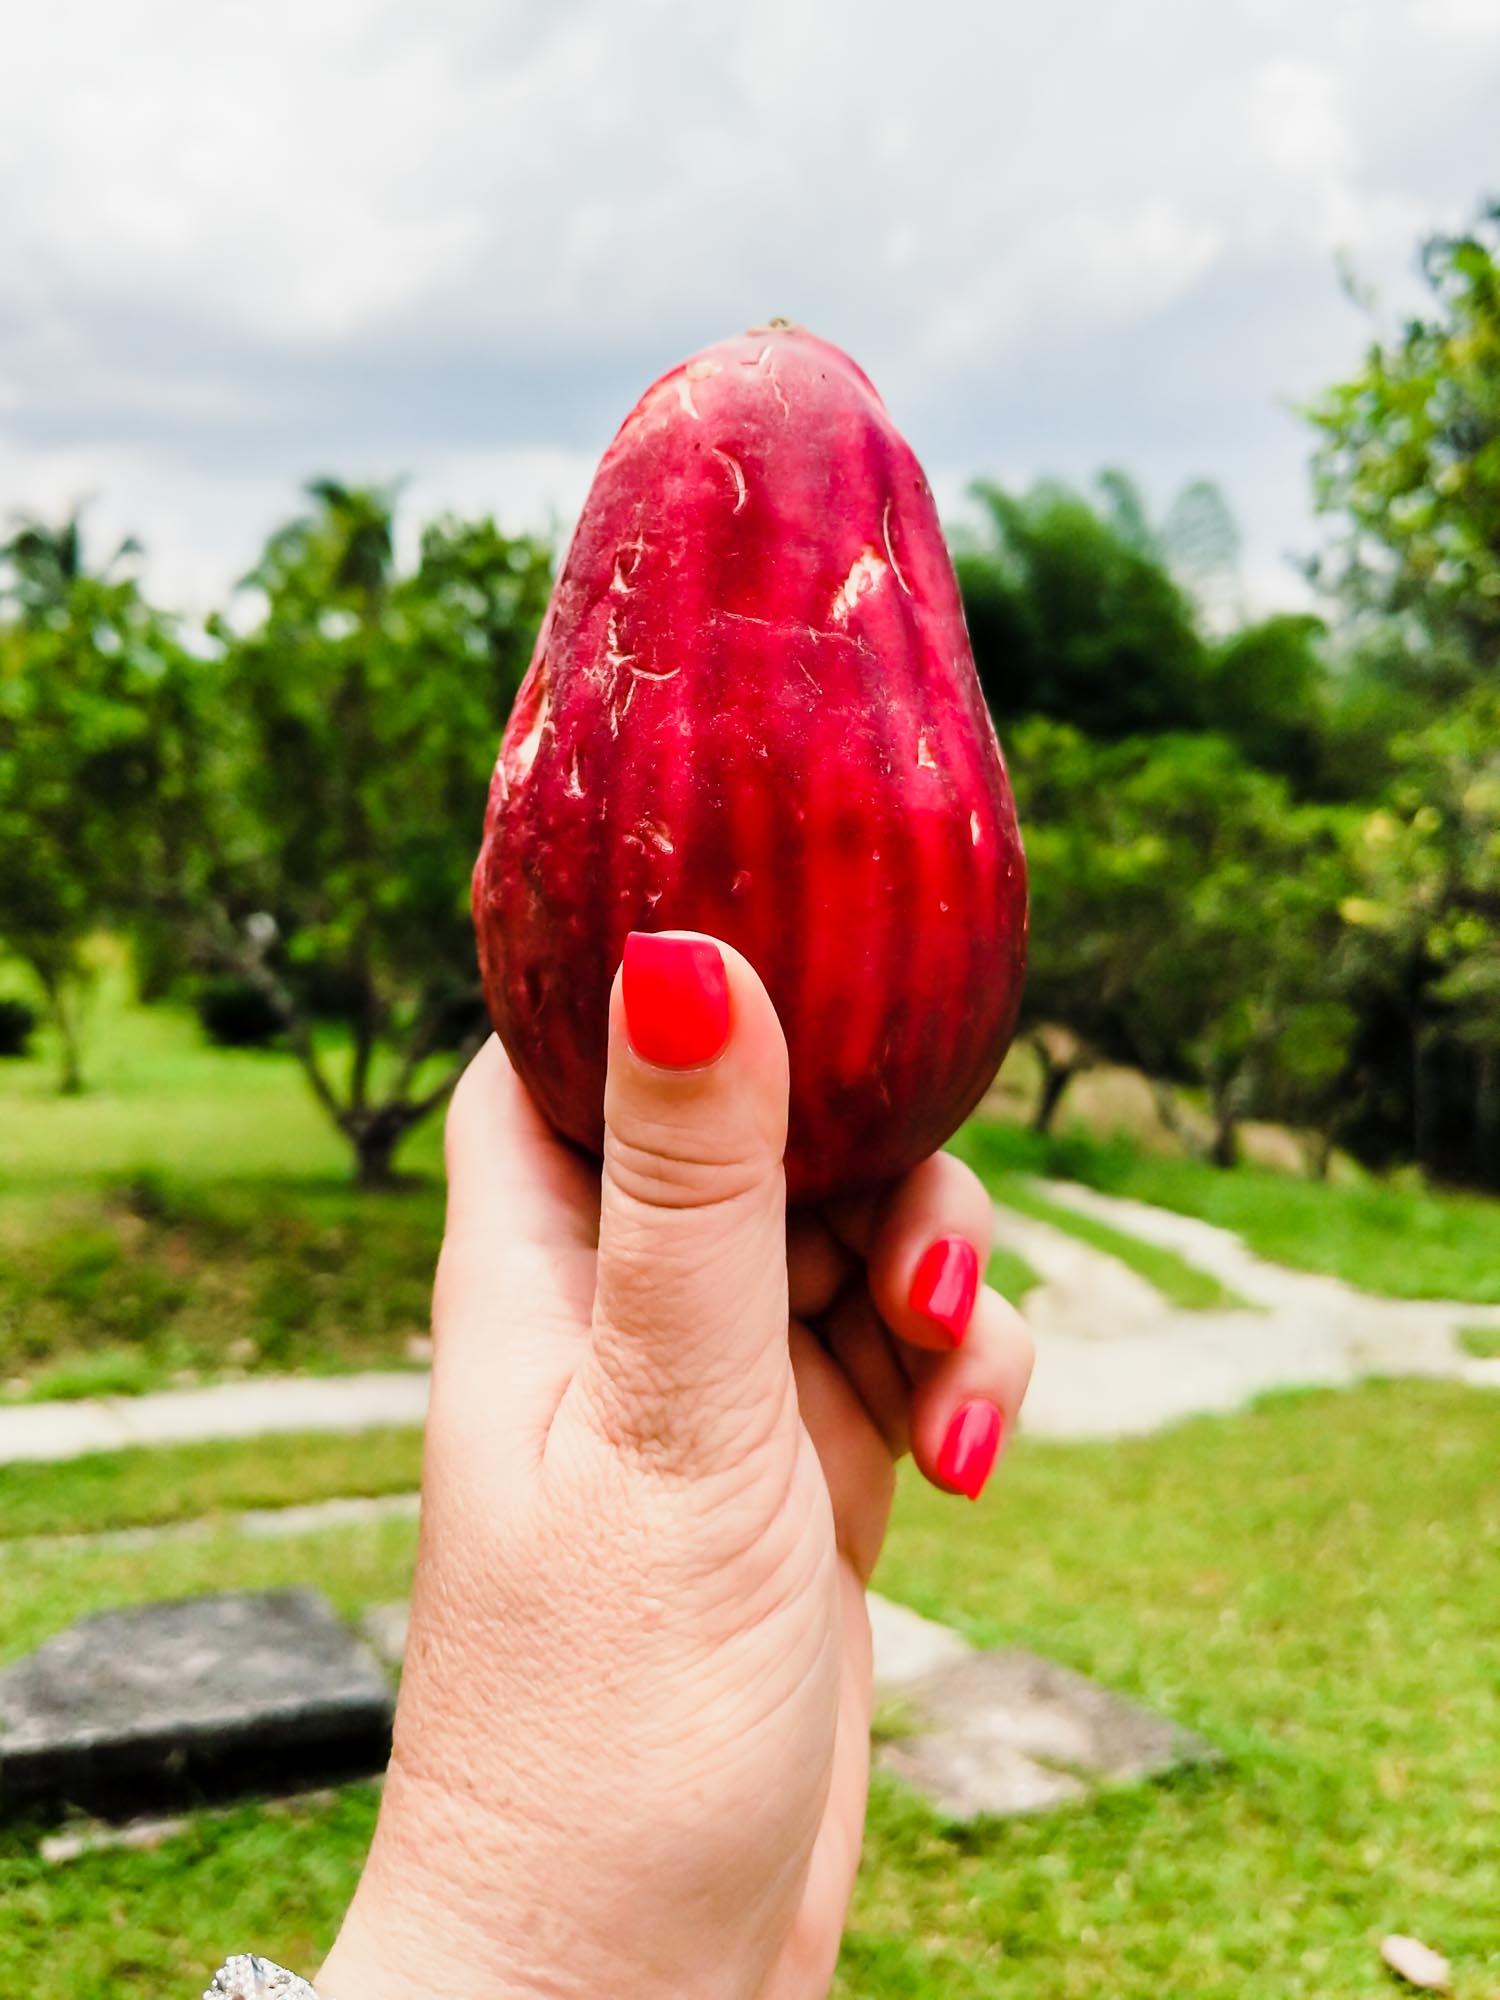 Mountain apple fruit in Hawaii